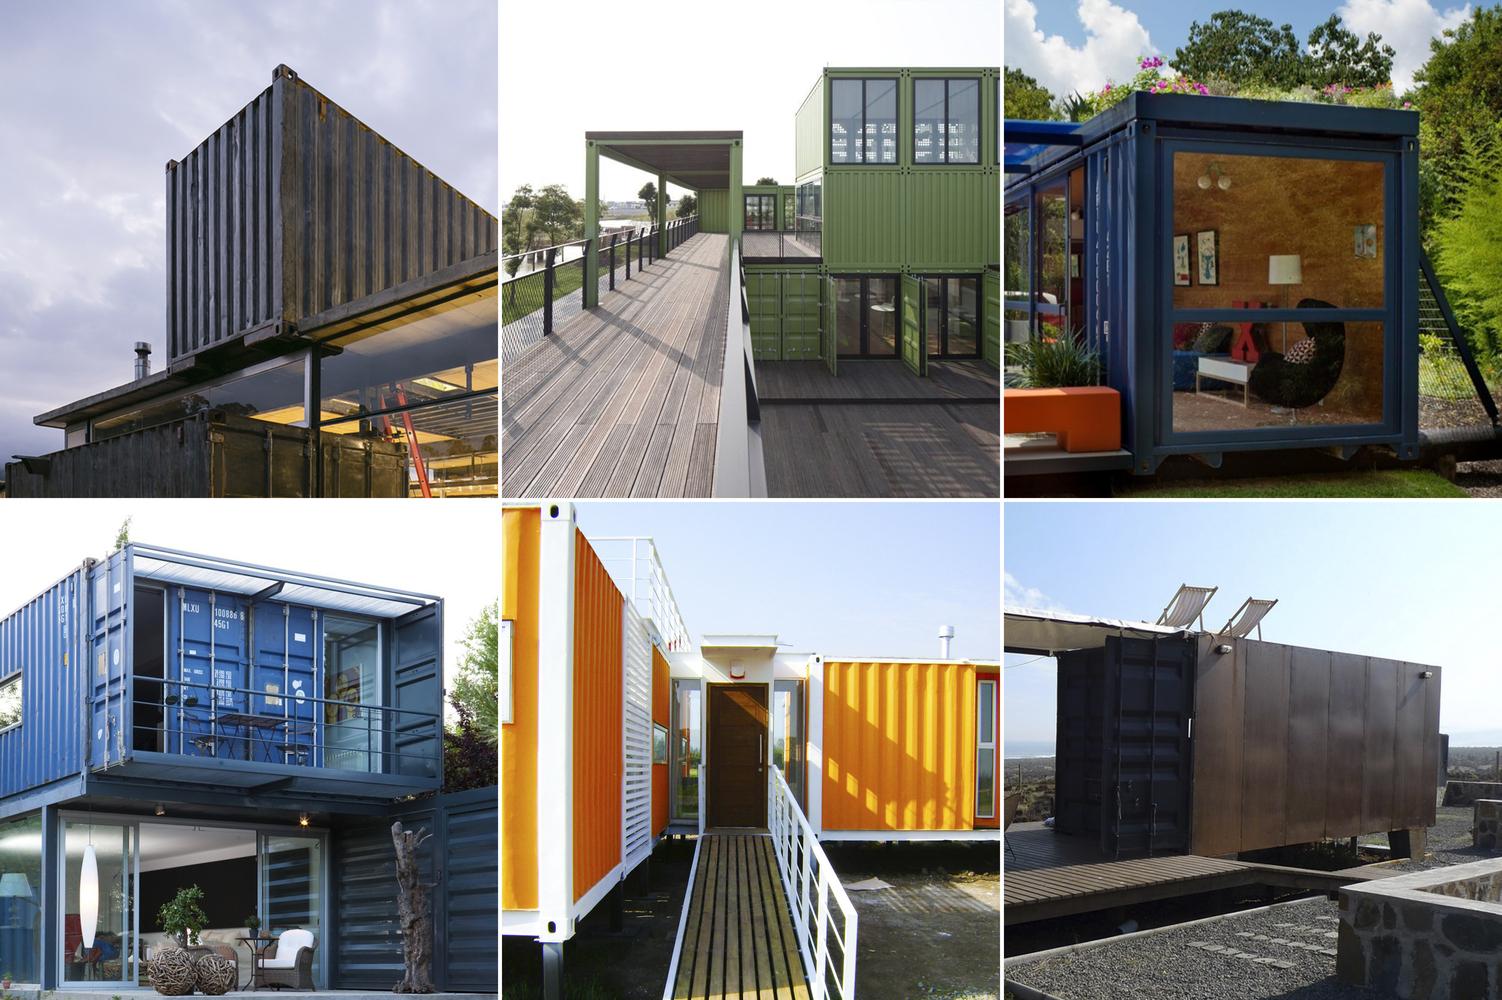 gallery of method in modular: 10 floor plans using shipping